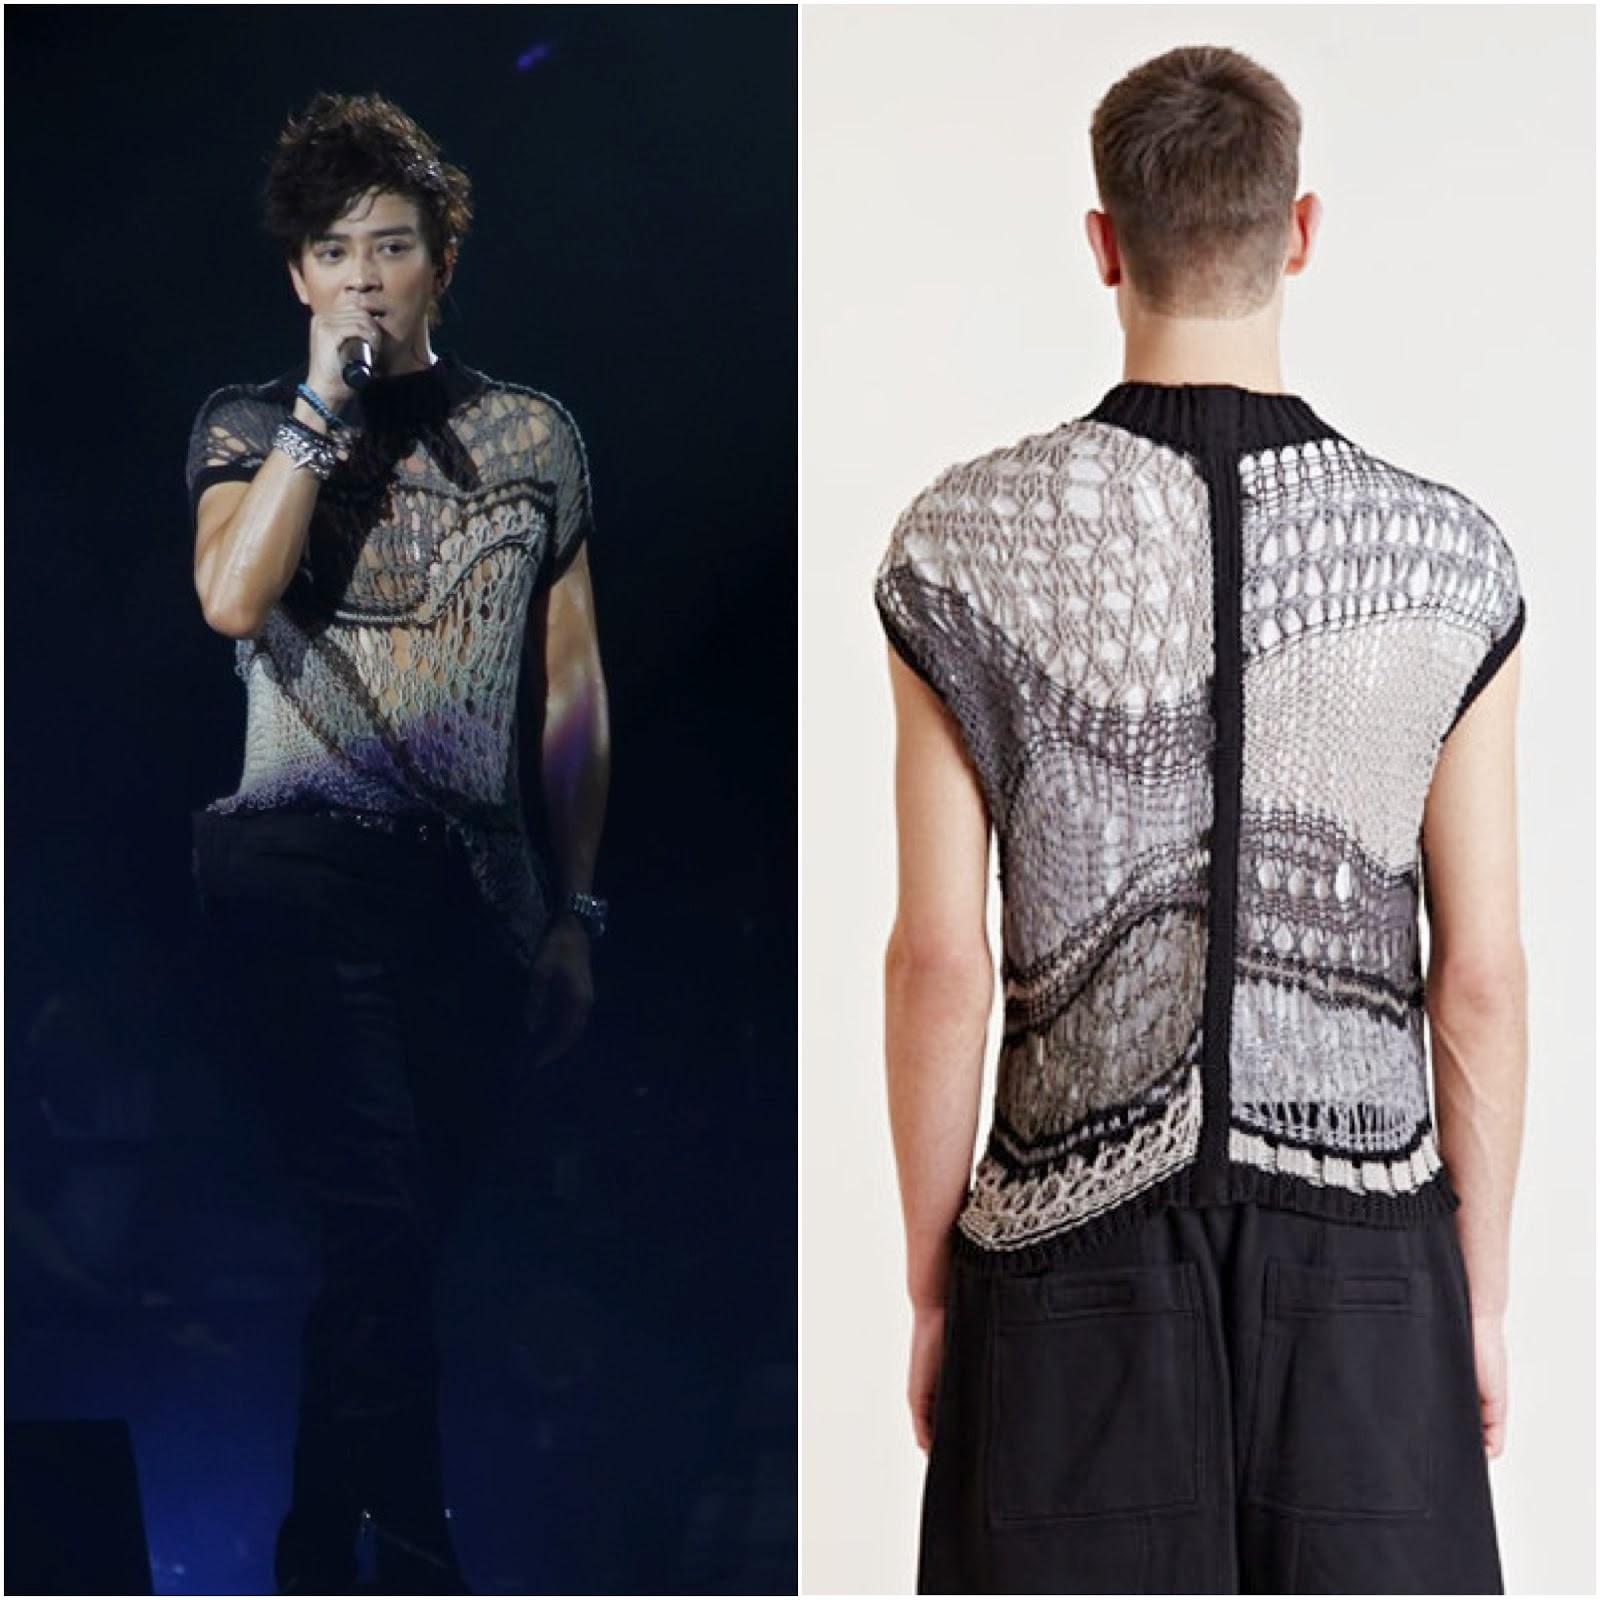 00O00 Menswear Blog: Daniel Chan [陈晓东] in Rick Owens - Hong Kong Concert